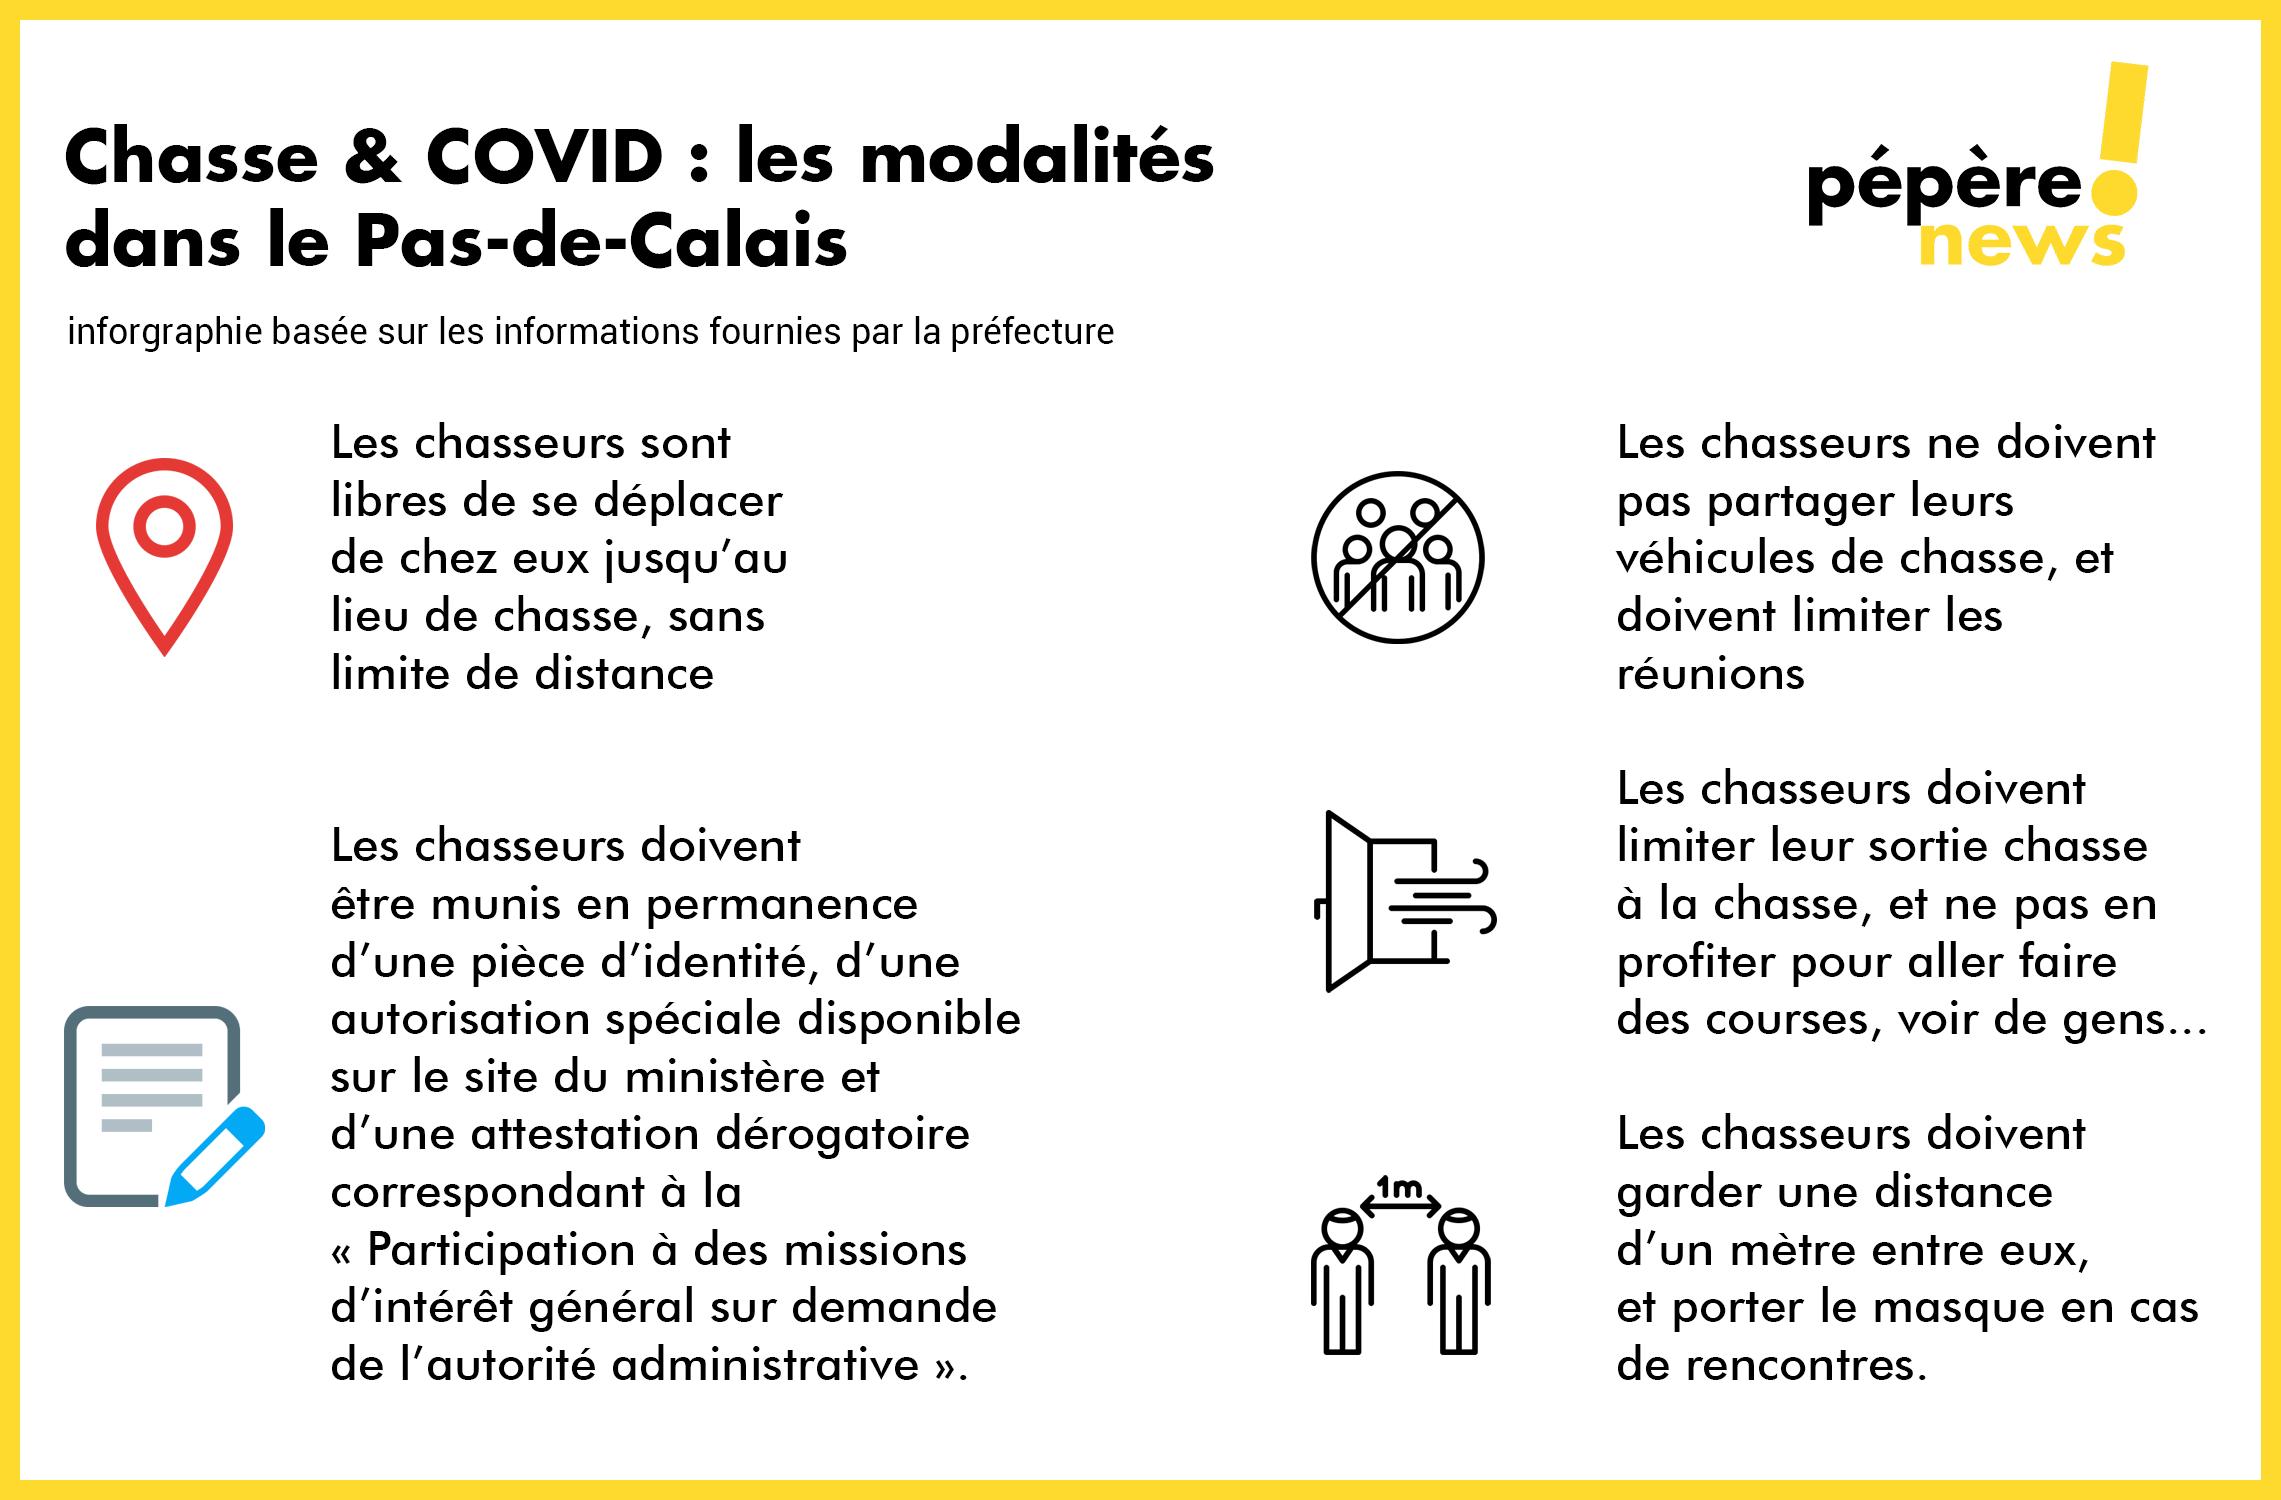 Chasseur Pas-de-Calais